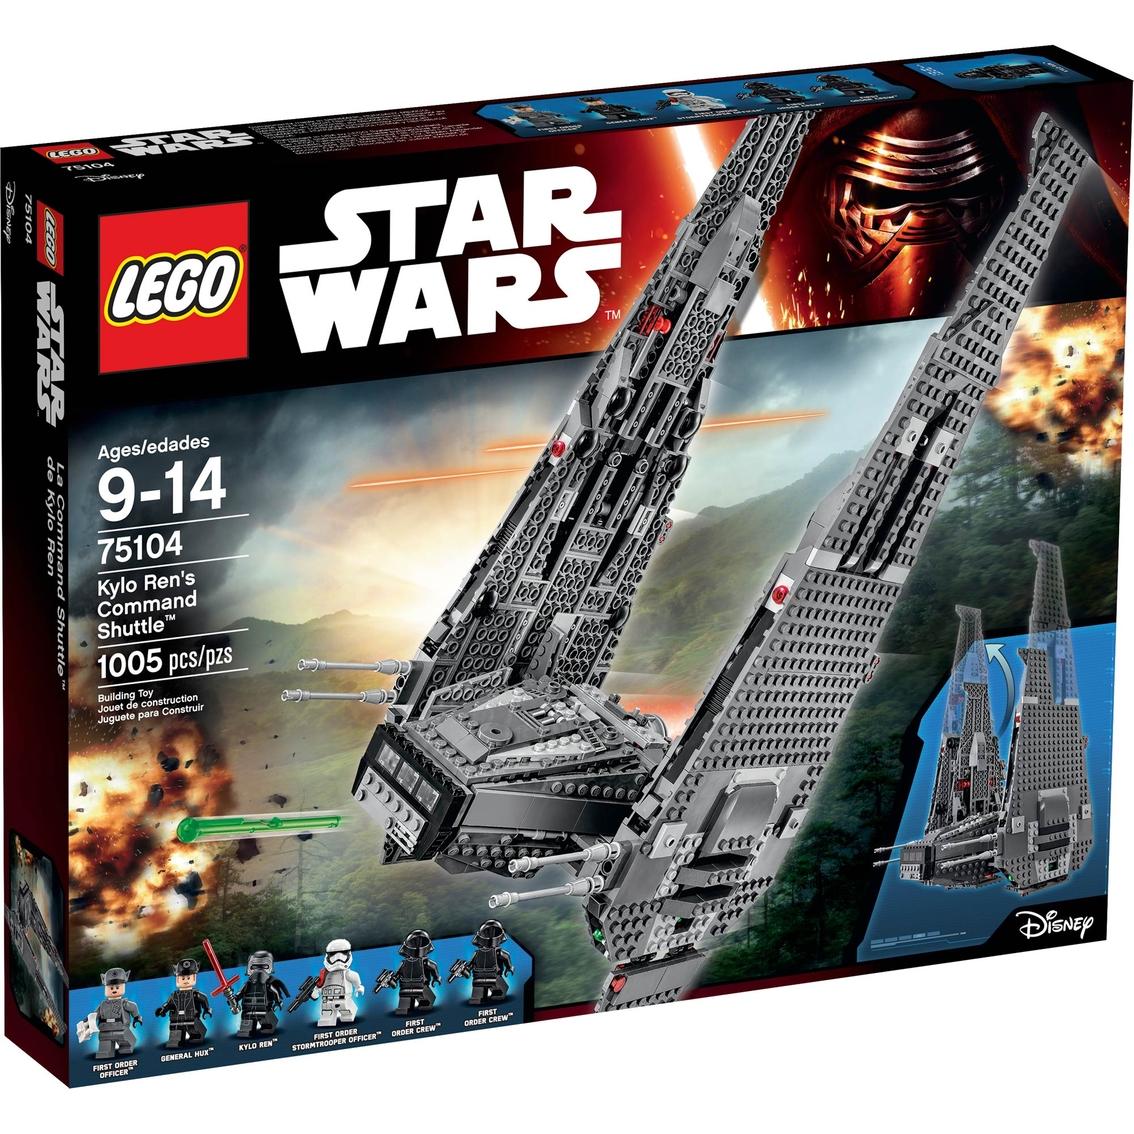 Lego Star Wars Kylo Ren's Command Shuttle | Building Toys